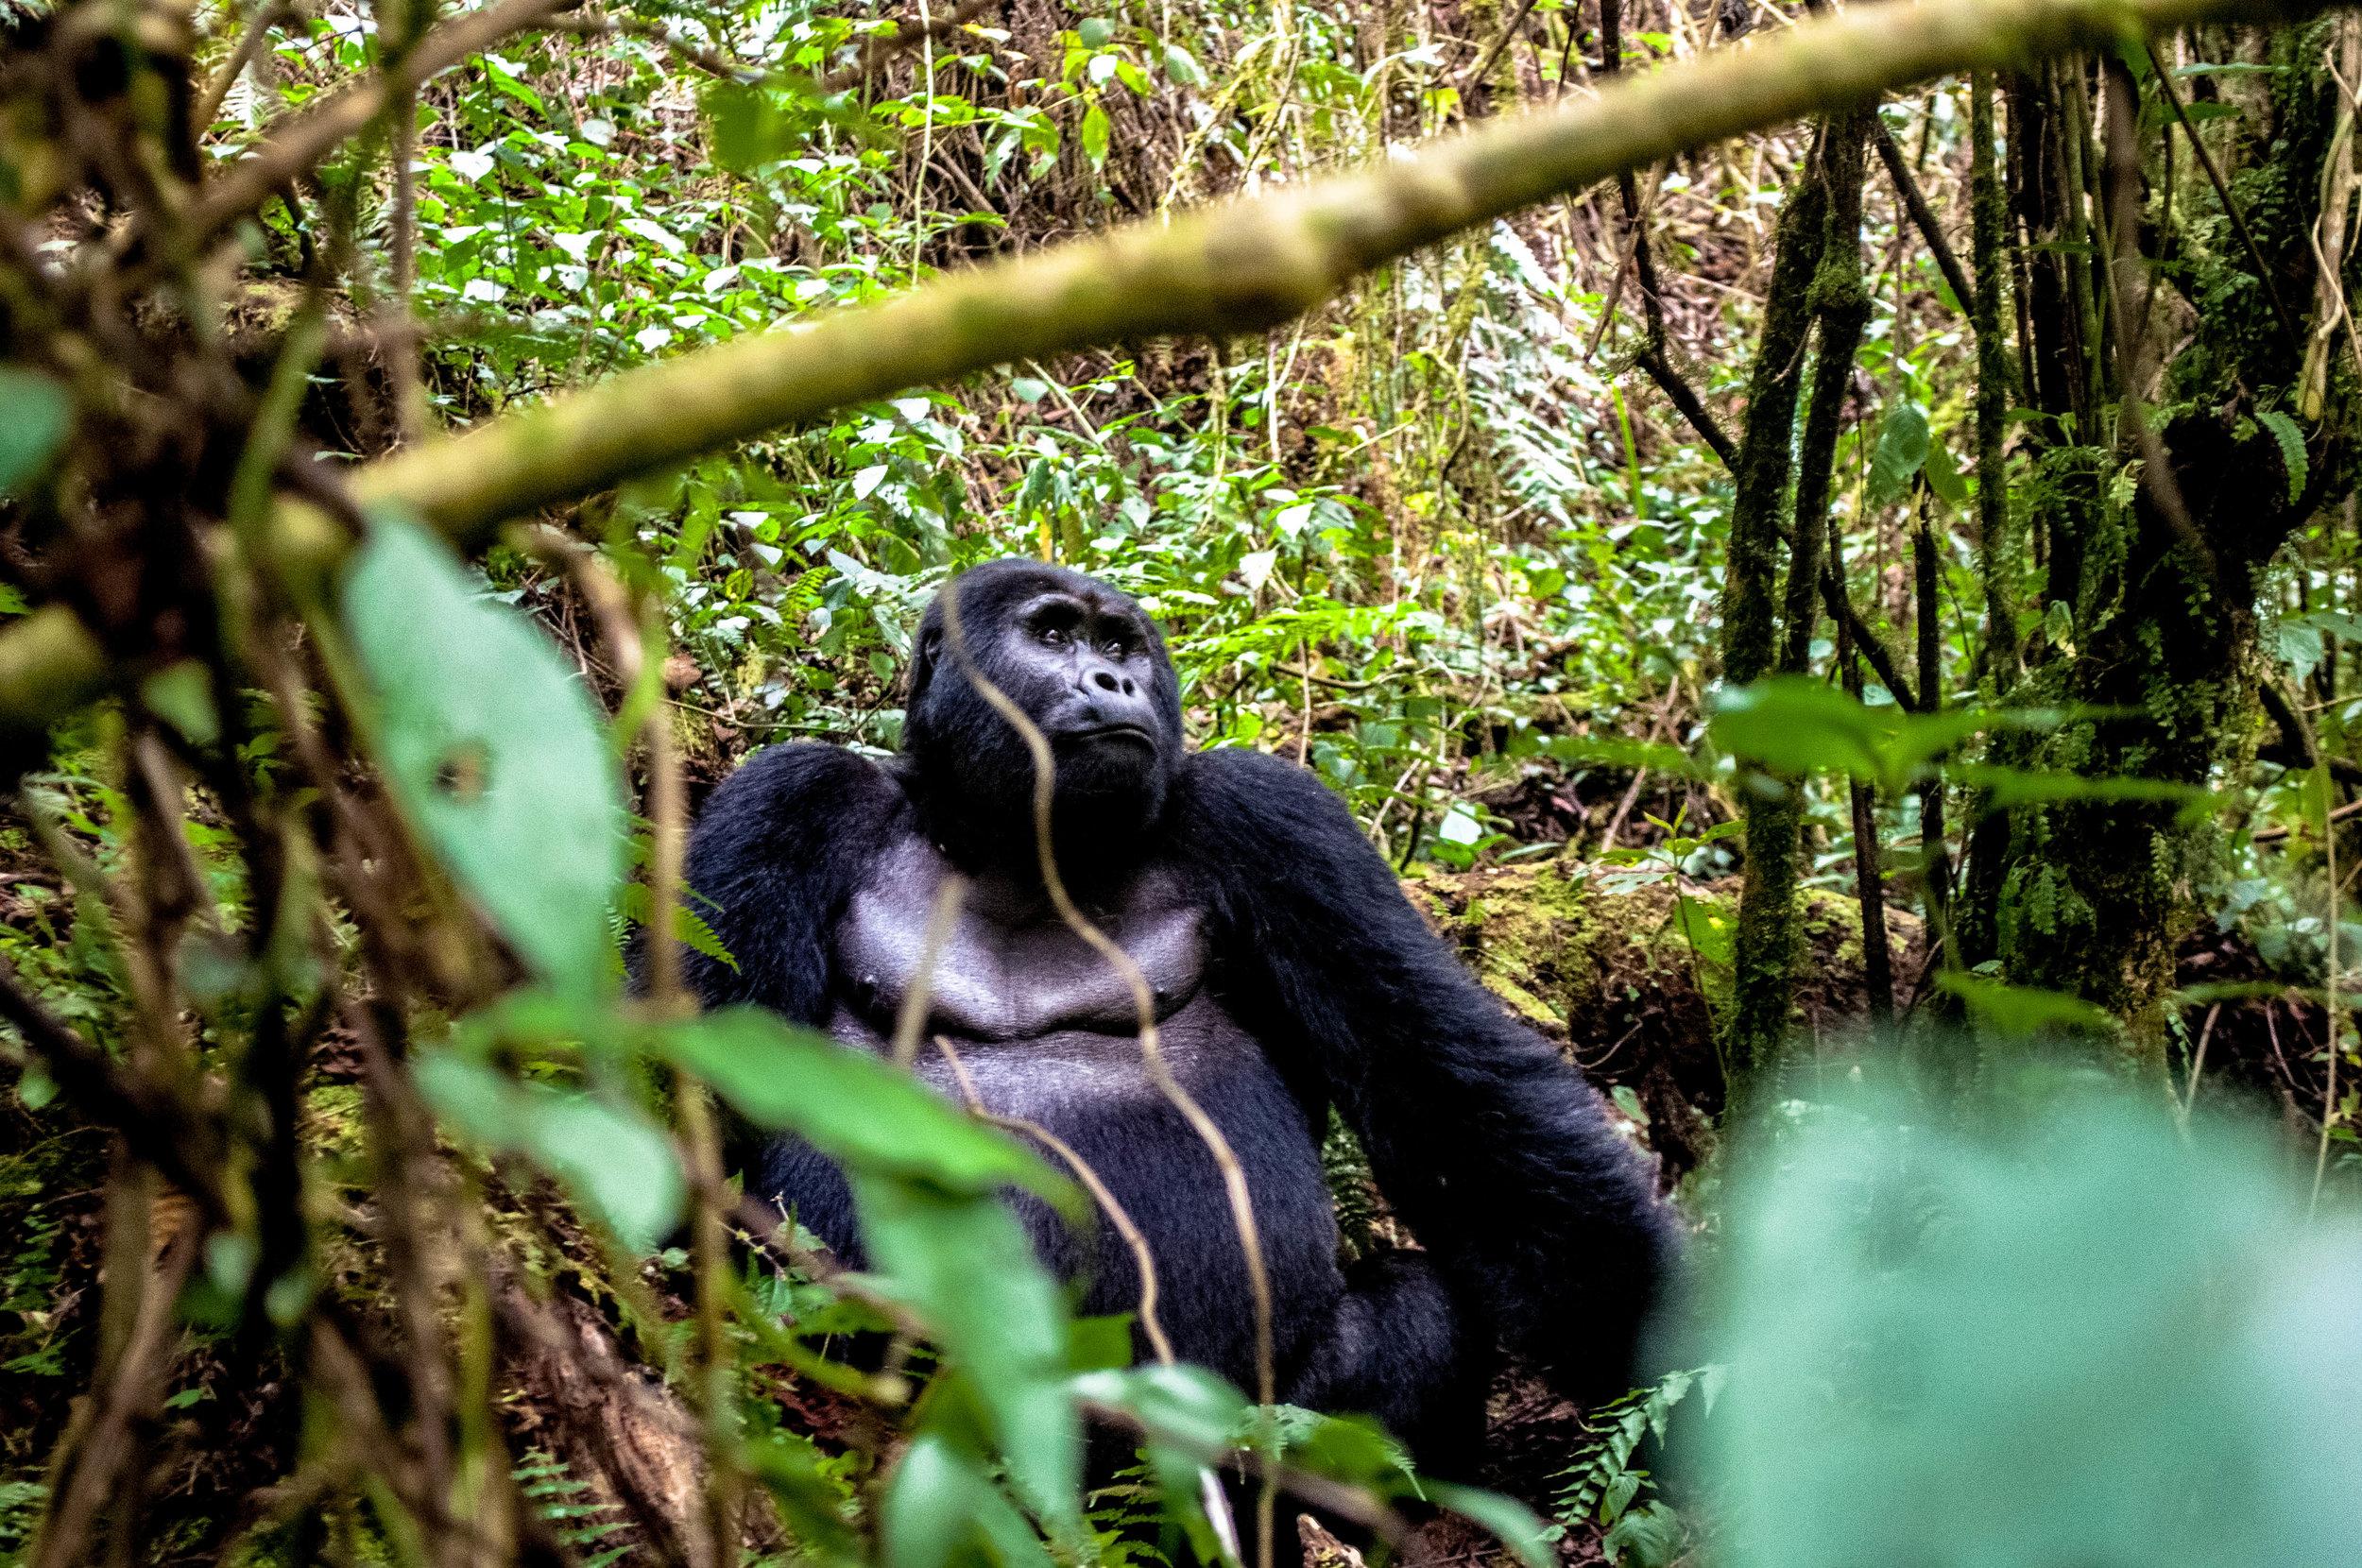 Gorilla-4.jpg